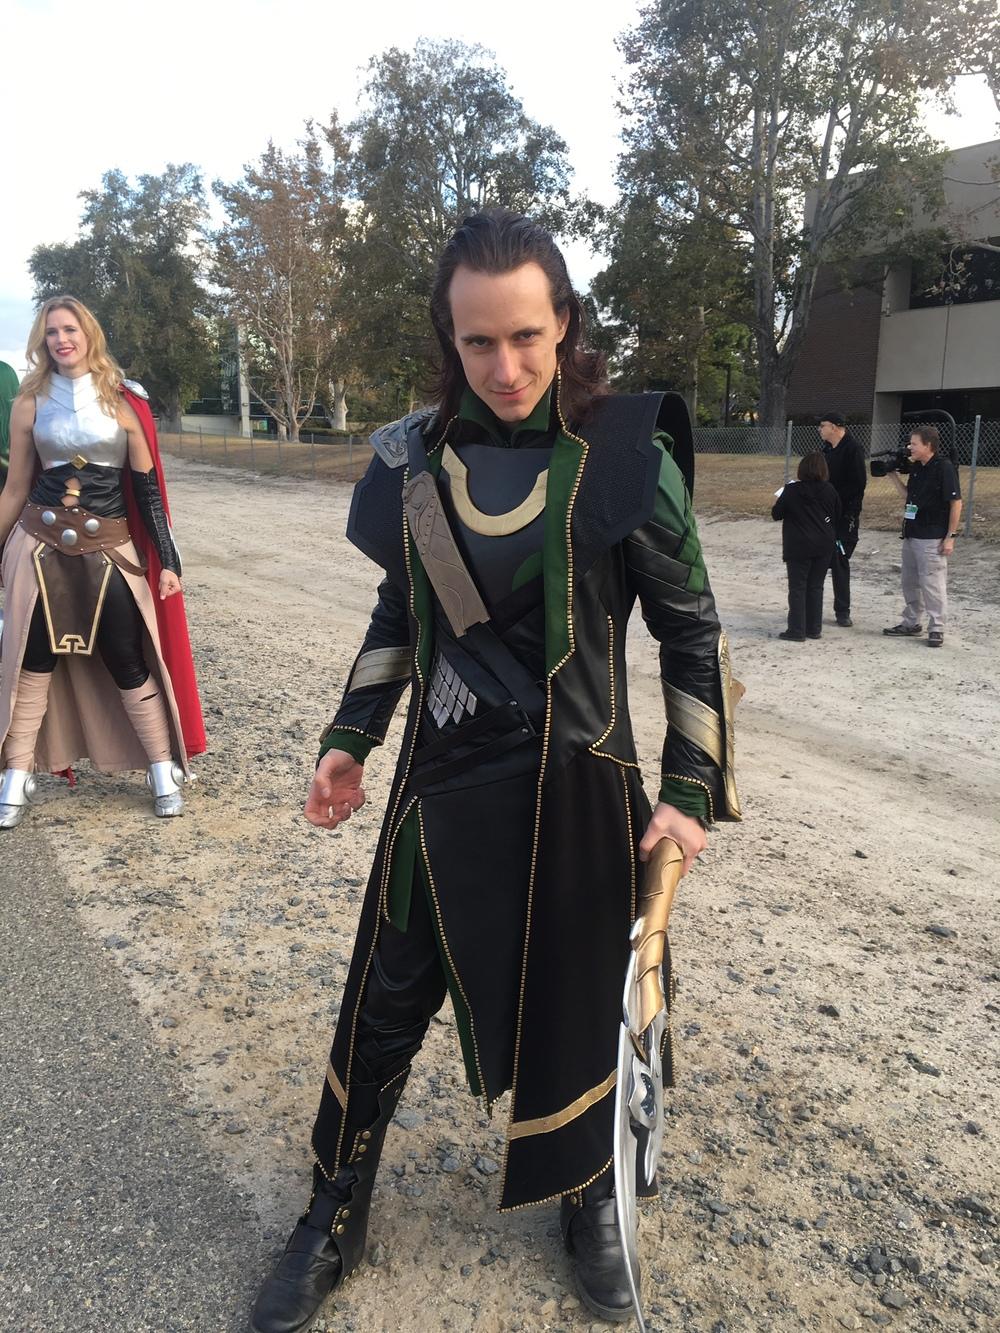 avengers-half-marathon-cosplayer-loki.jpg